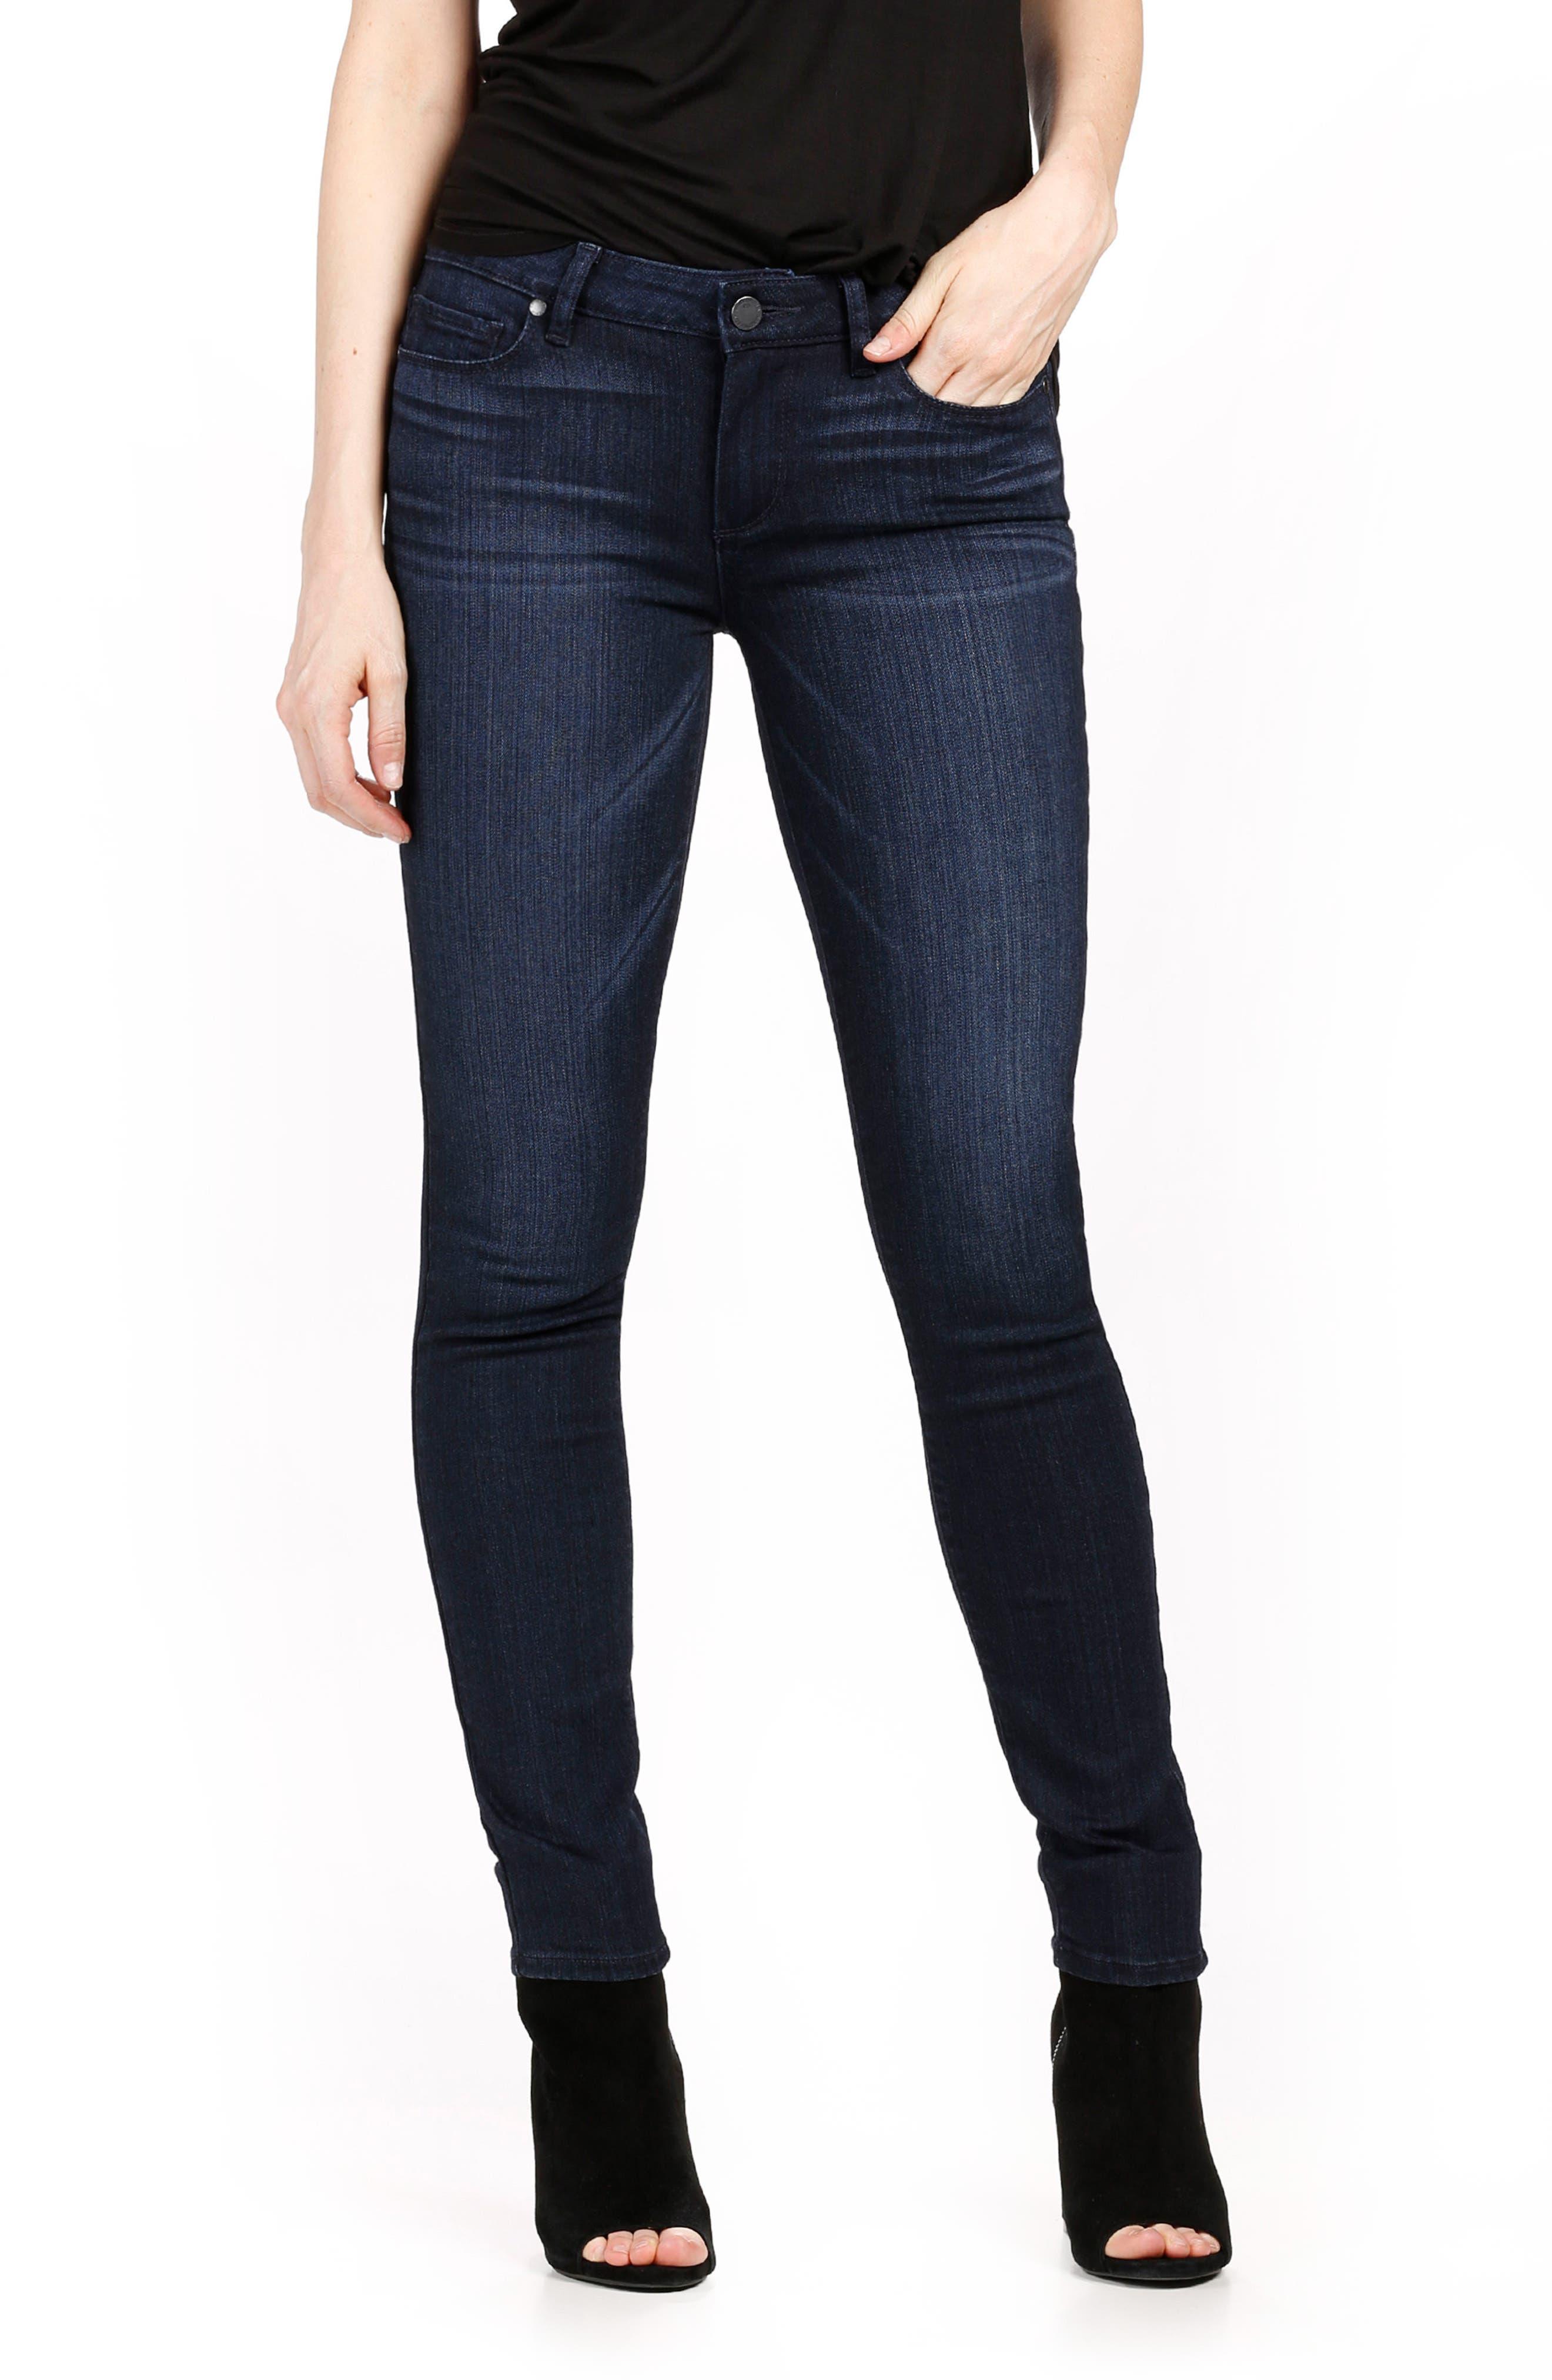 Transcend - Verdugo Ultra Skinny Jeans,                         Main,                         color,